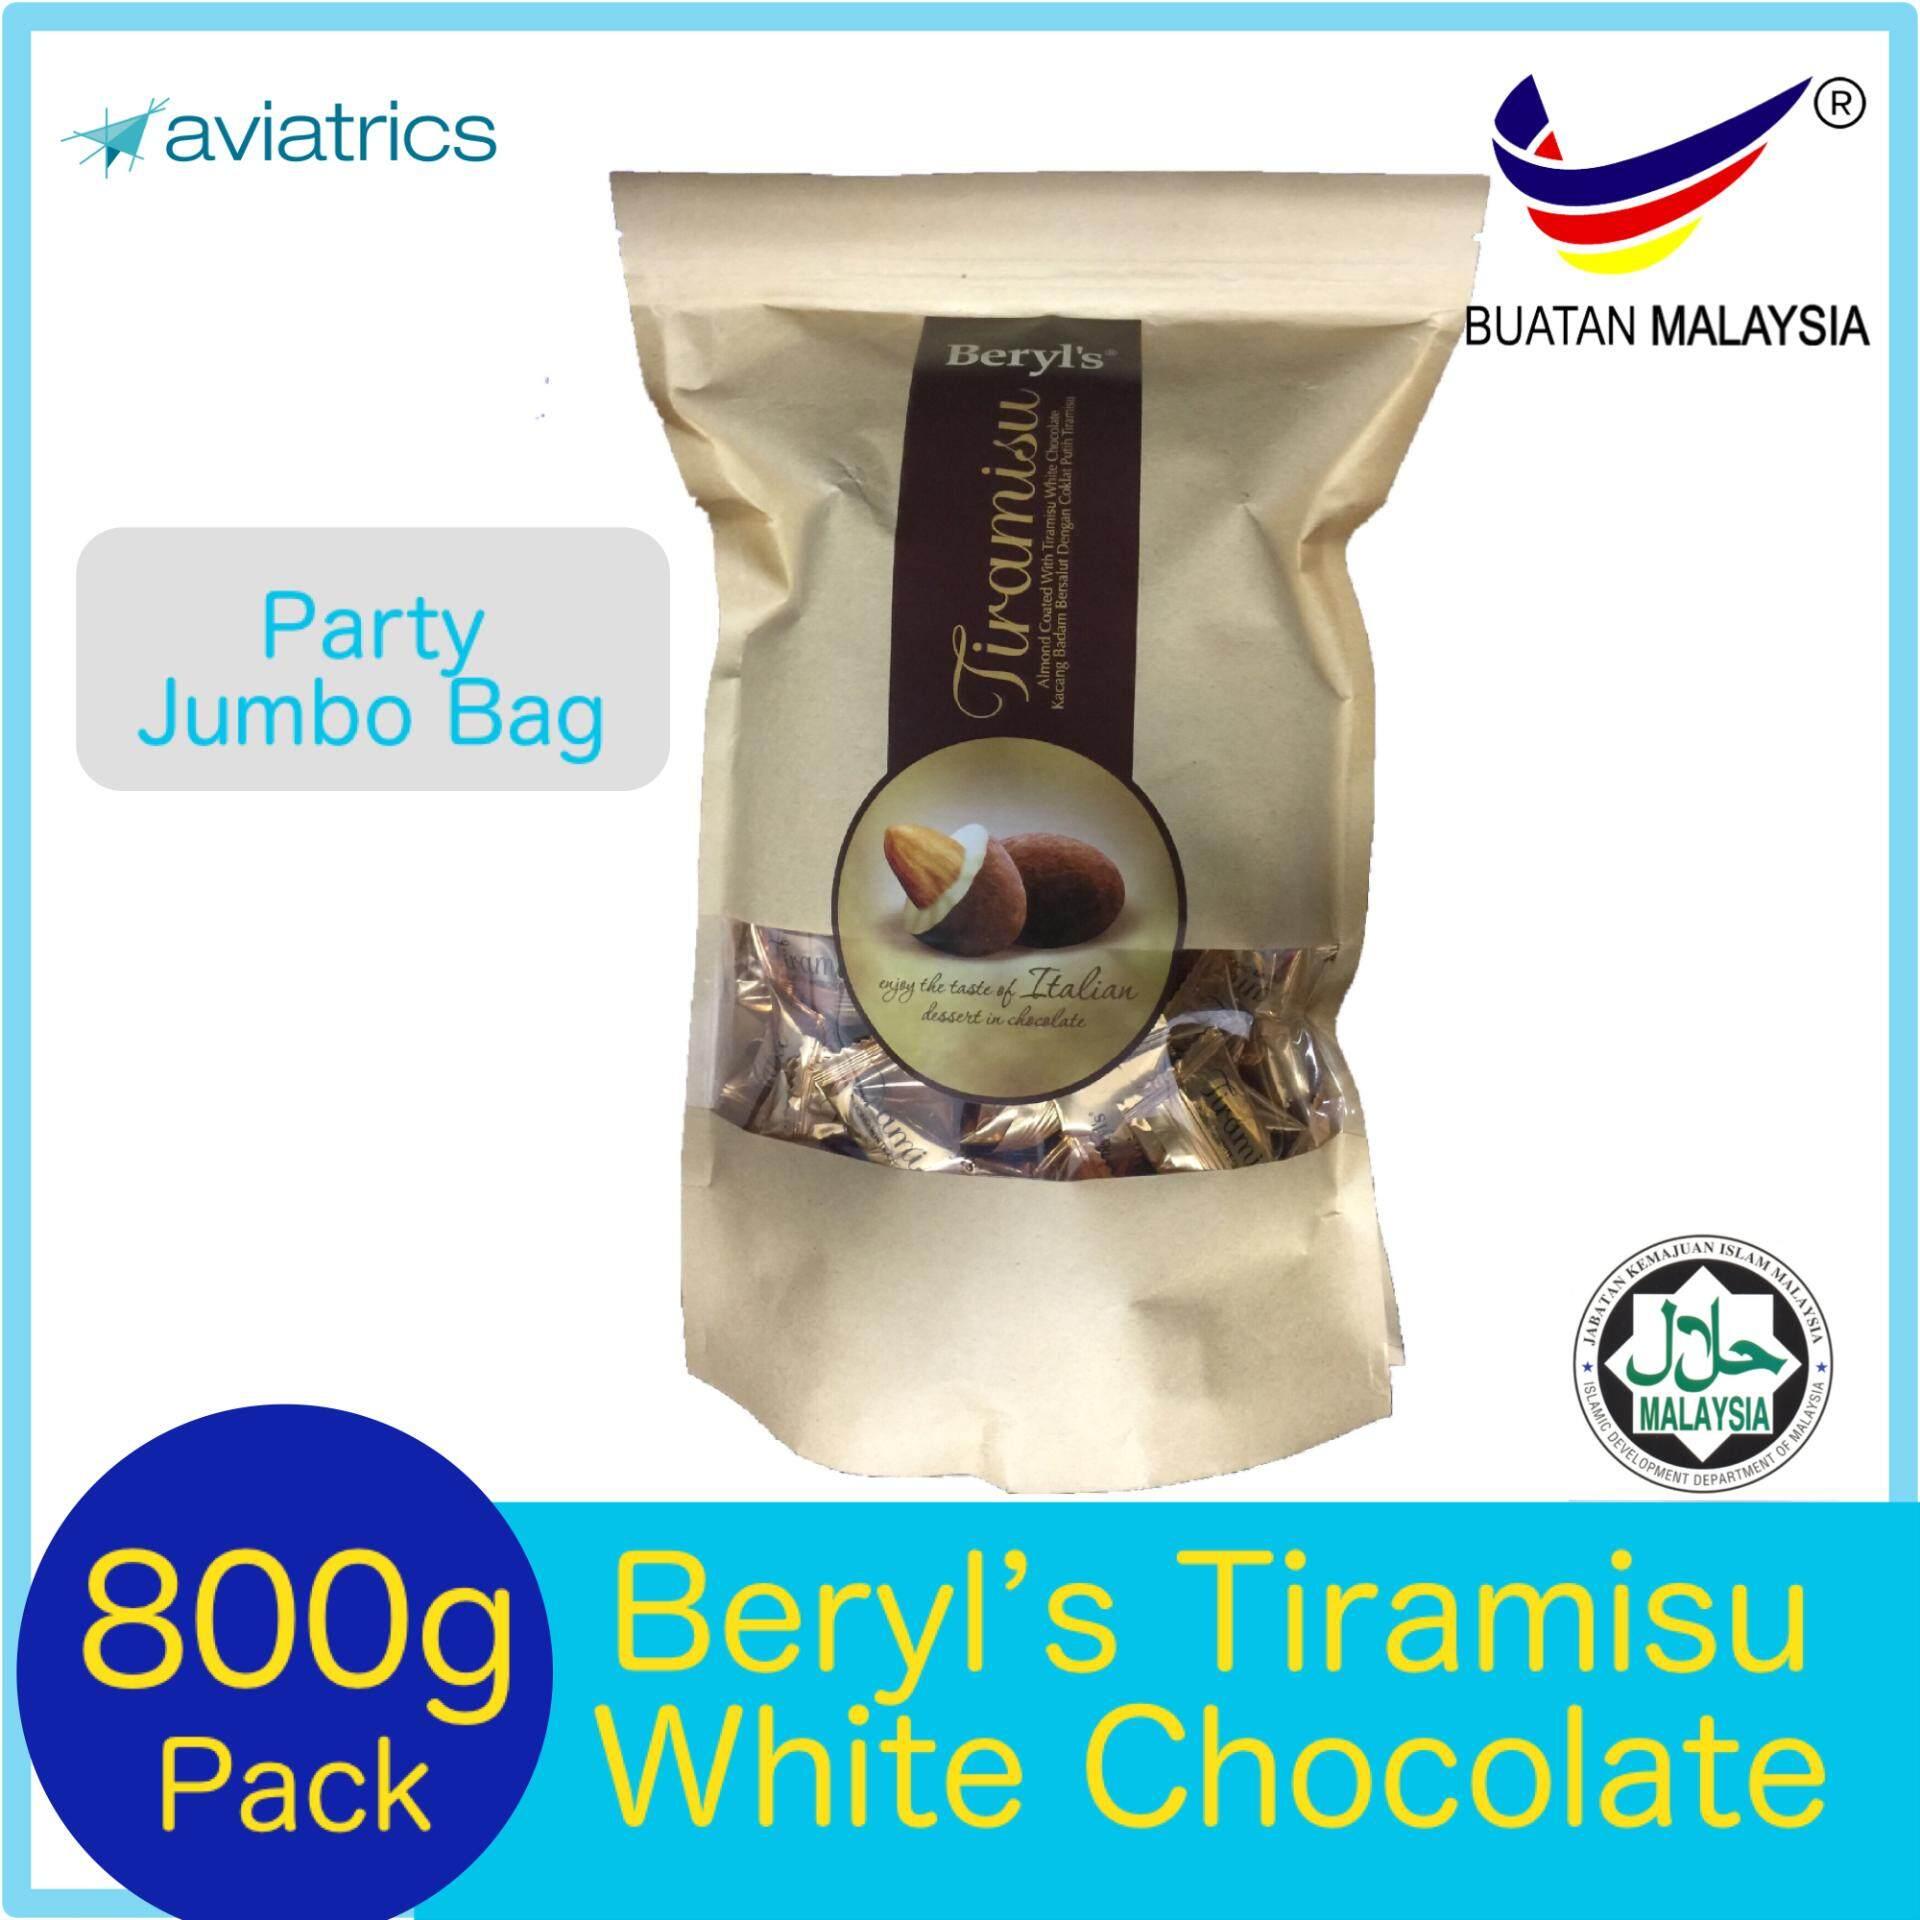 Beryl's Tiramisu White Chocolate with Almonds 800g (Made in Malaysia)